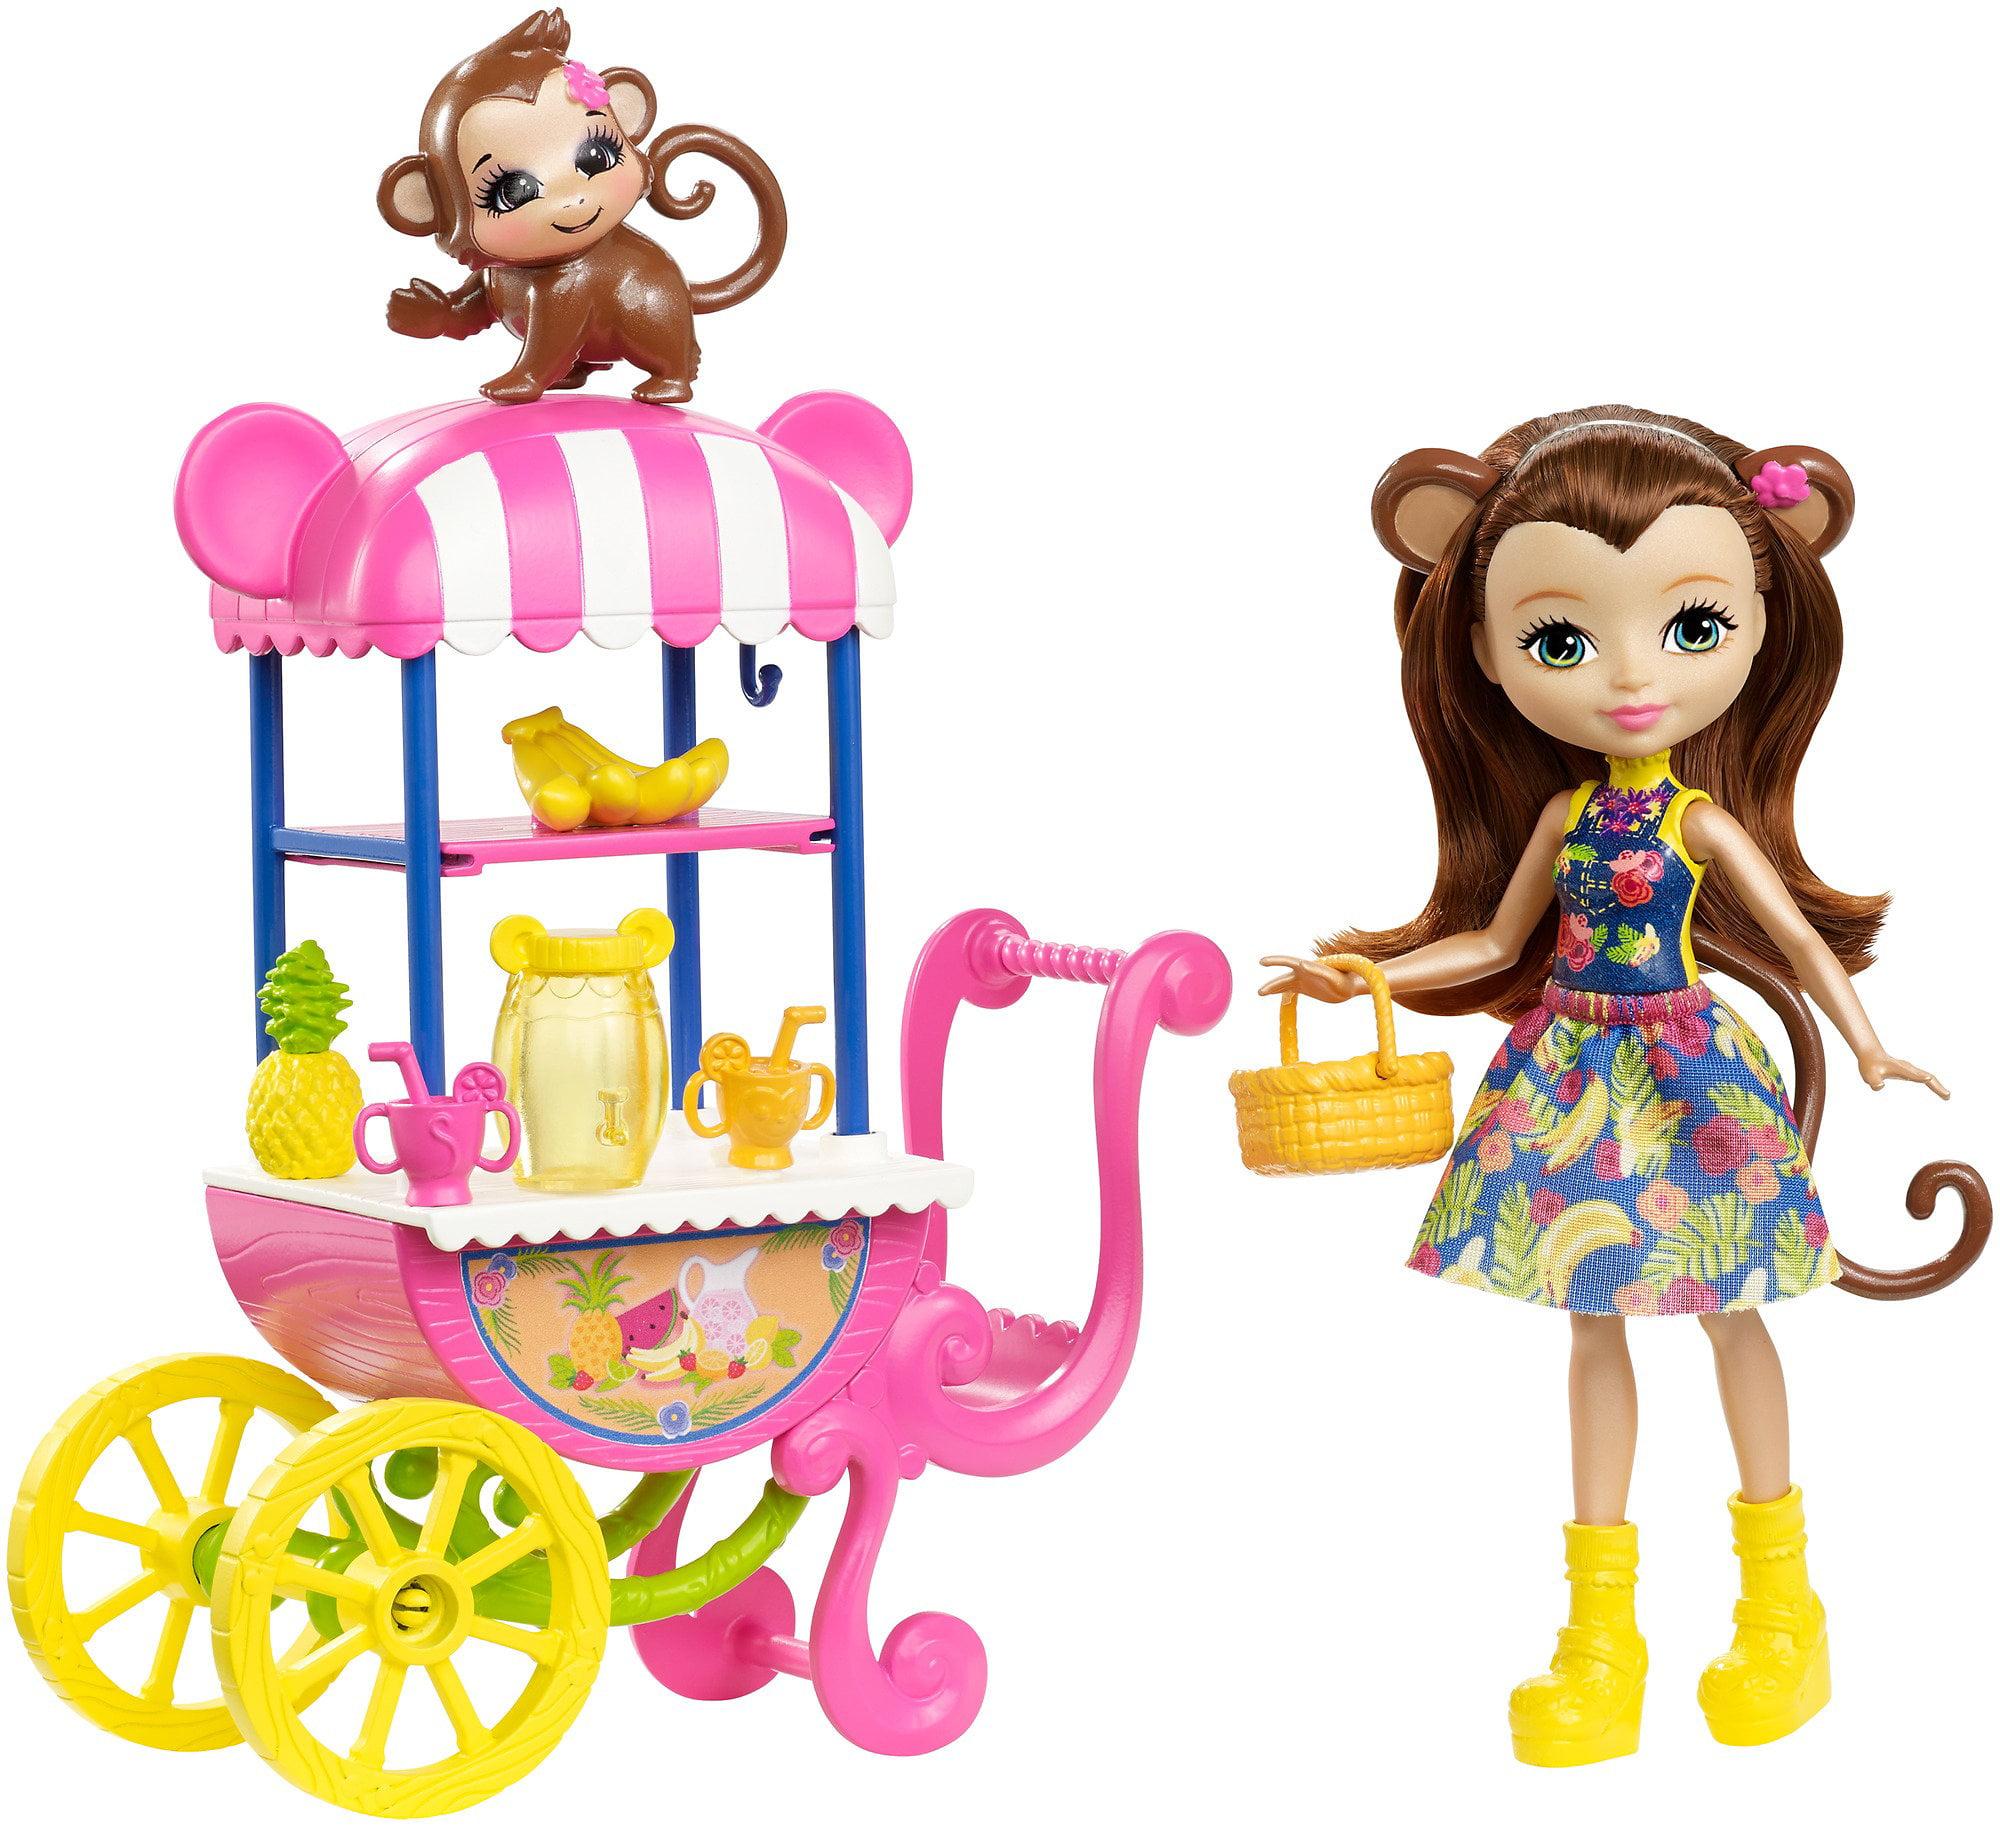 Enchantimals Fruit Cart Doll Set by Mattel